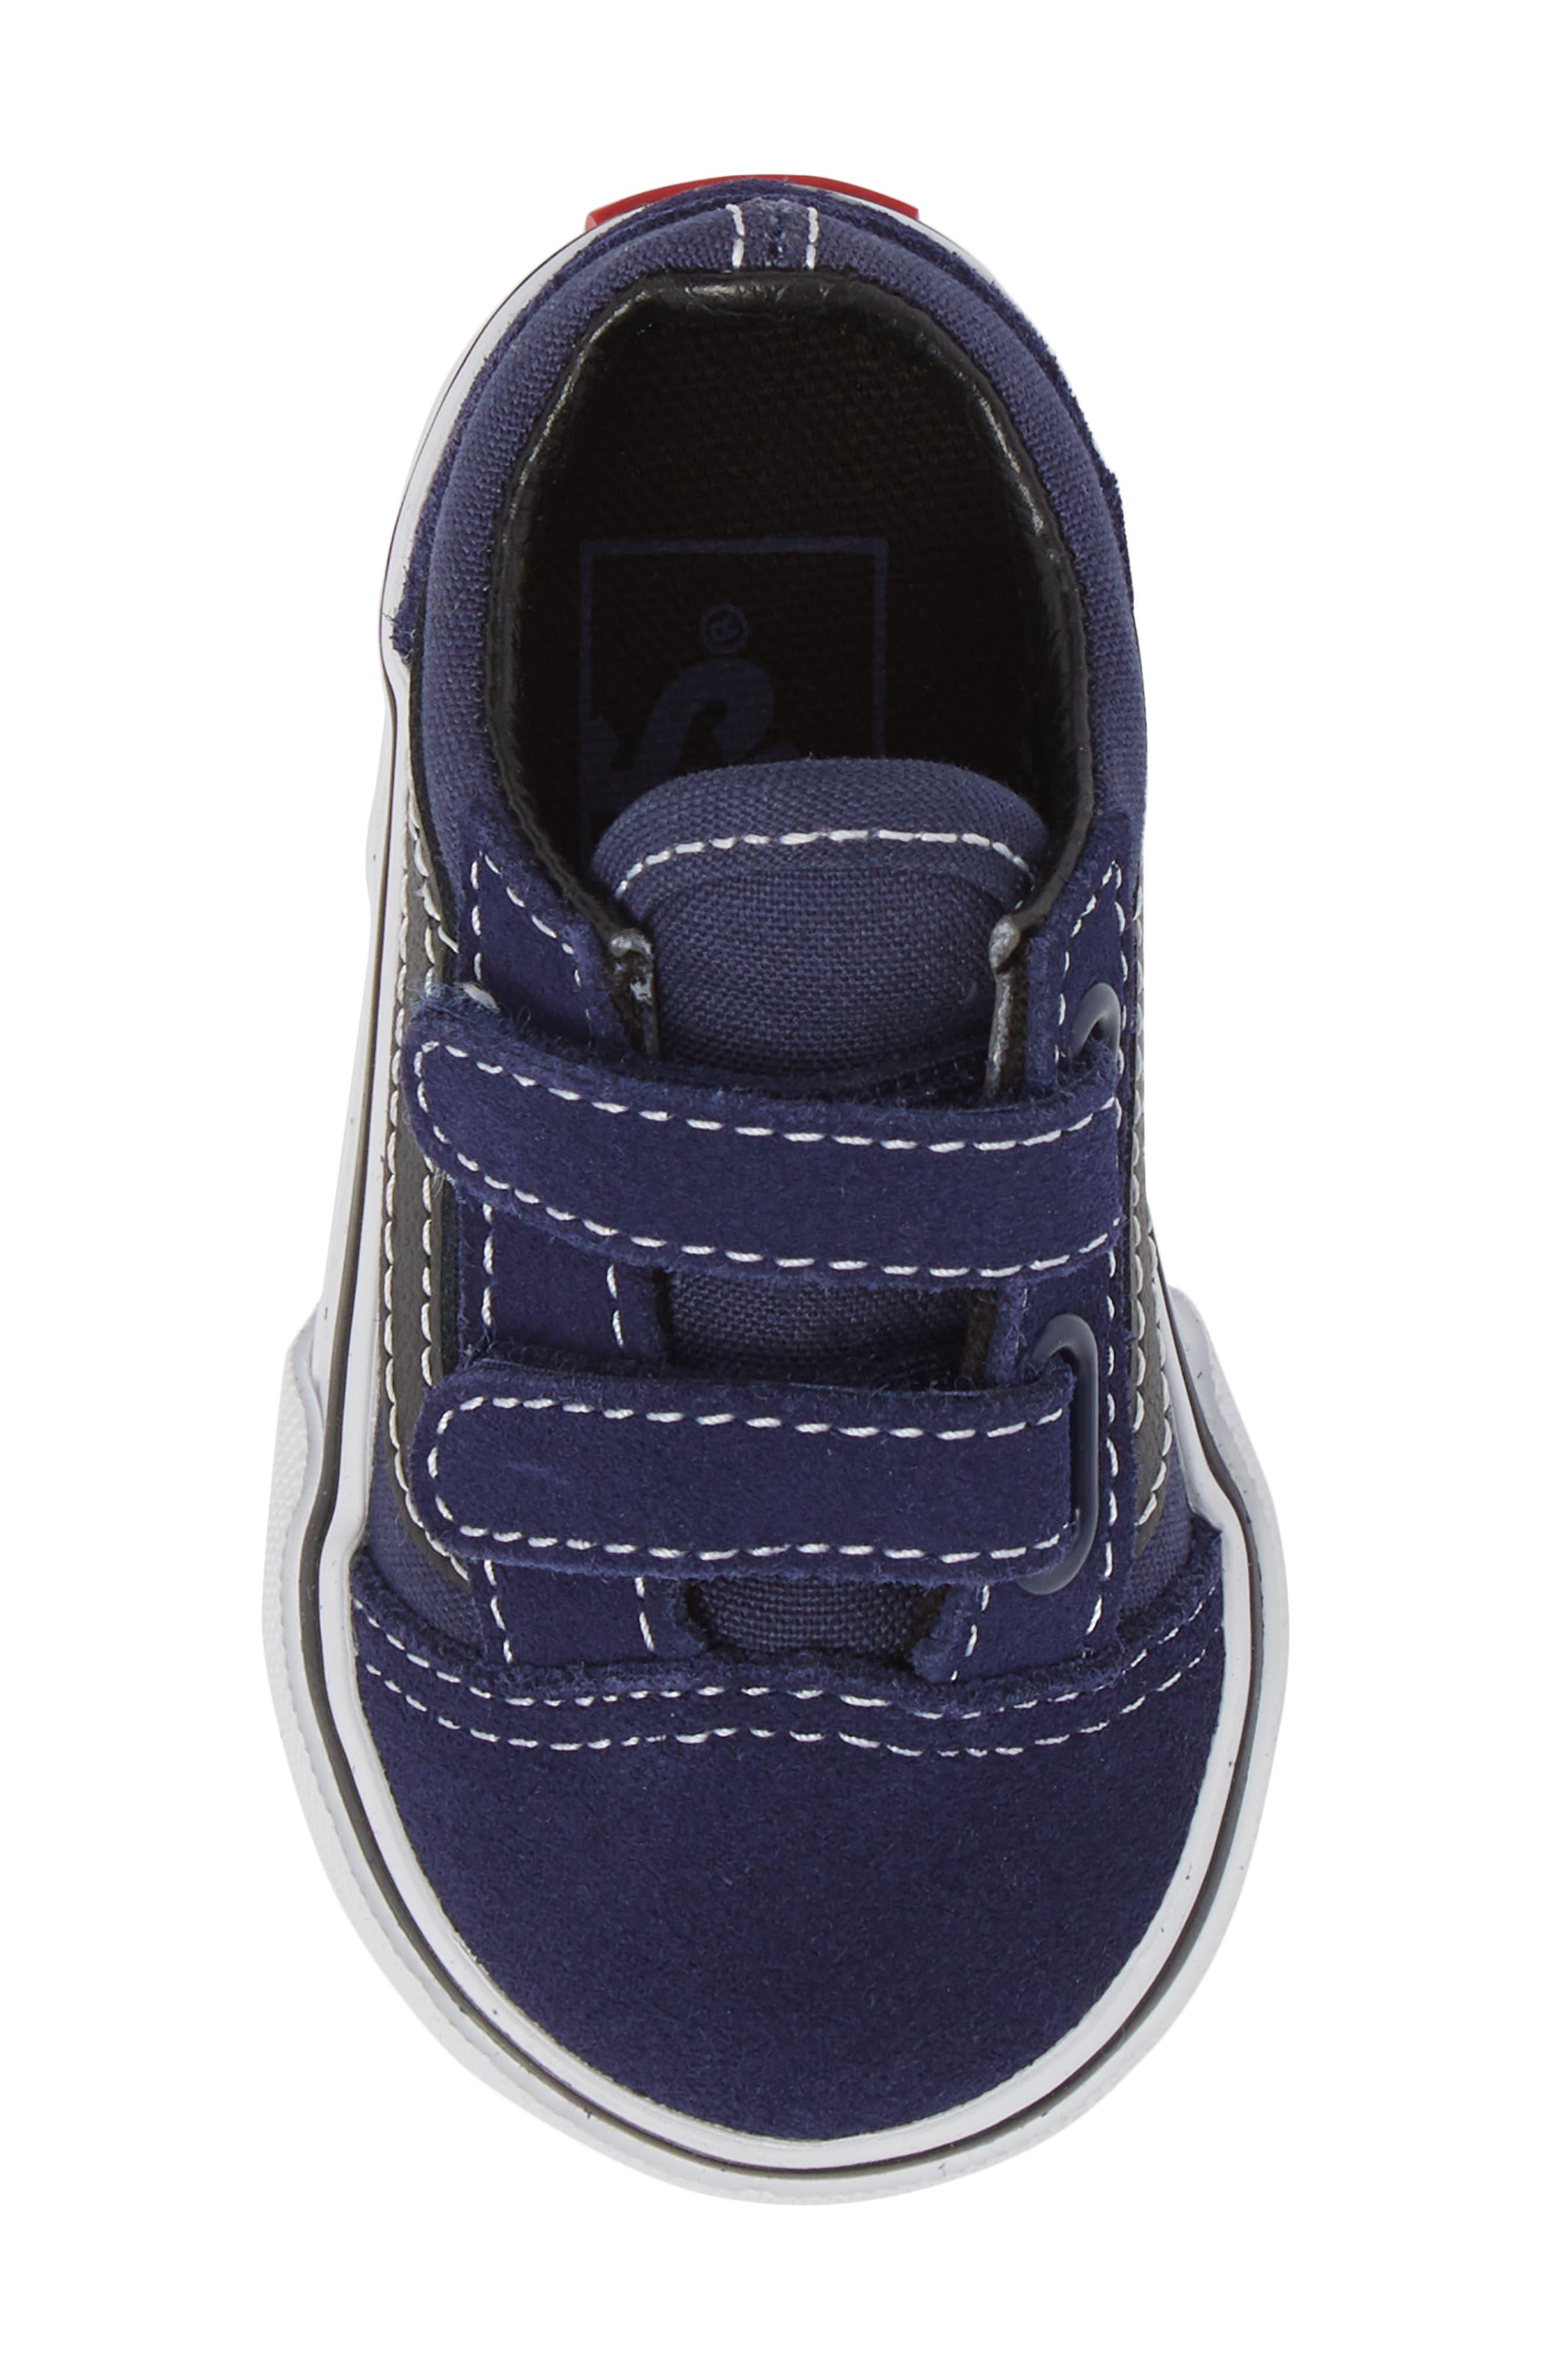 Old Skool V Sneaker,                             Alternate thumbnail 4, color,                             Medieval Blue/ Black